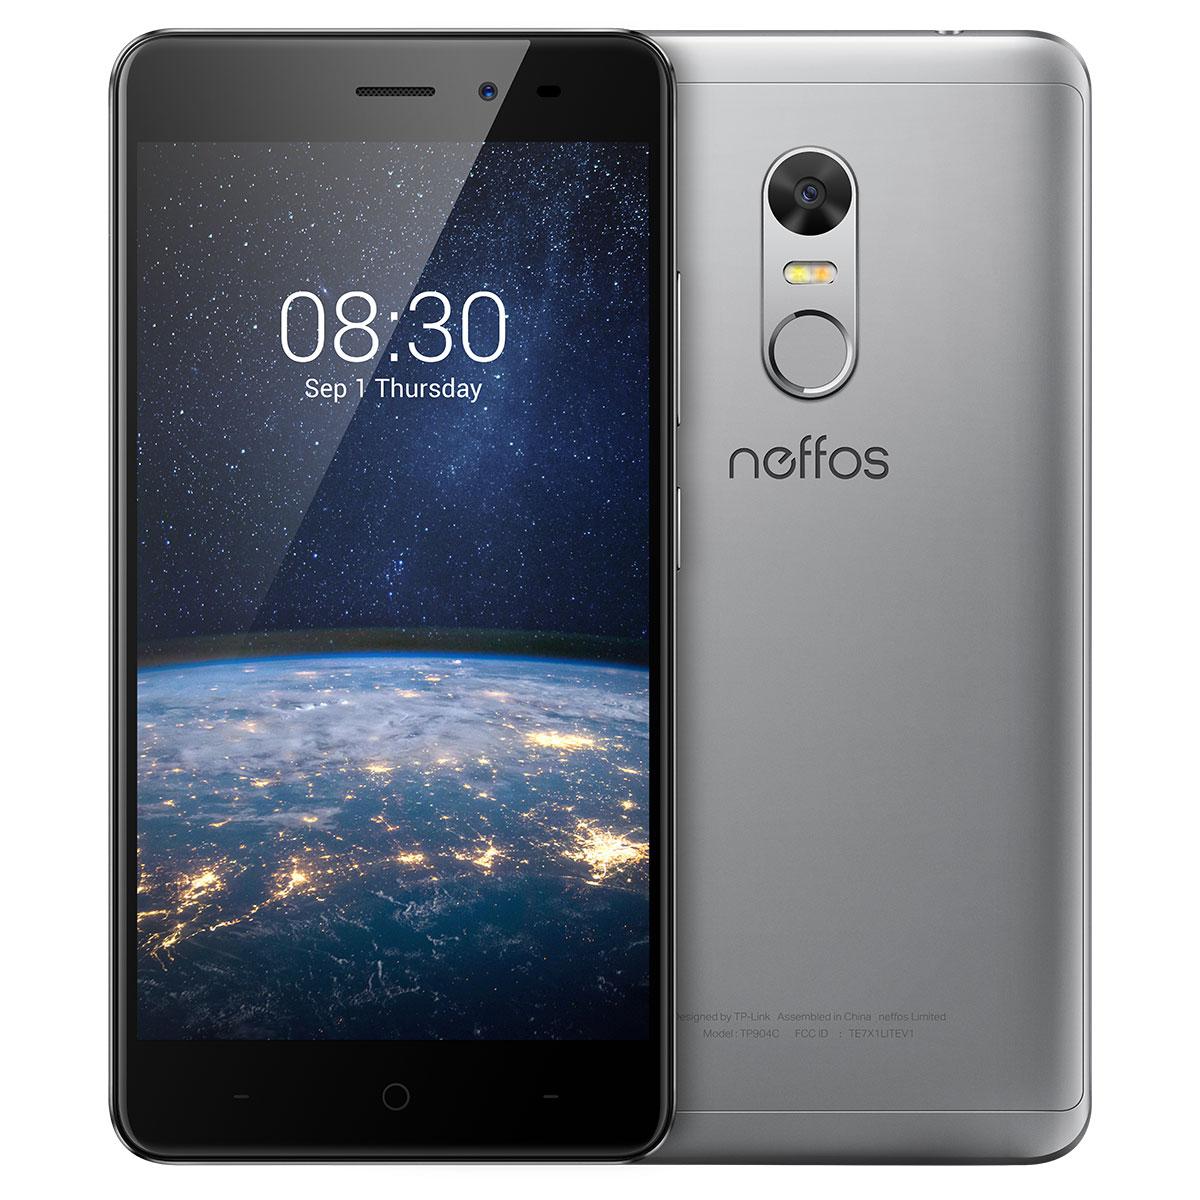 "Mobile & smartphone Neffos X1 Lite Gris ciel 16 Go Smartphone 4G-LTE Dual SIM - MediaTek MT6750 8-Core 1.5 GHz - RAM 2 Go - Ecran tactile 5"" 720 x 1280 - 16 Go - Bluetooth 4.1 - 2520 mAh - Android 7.0"